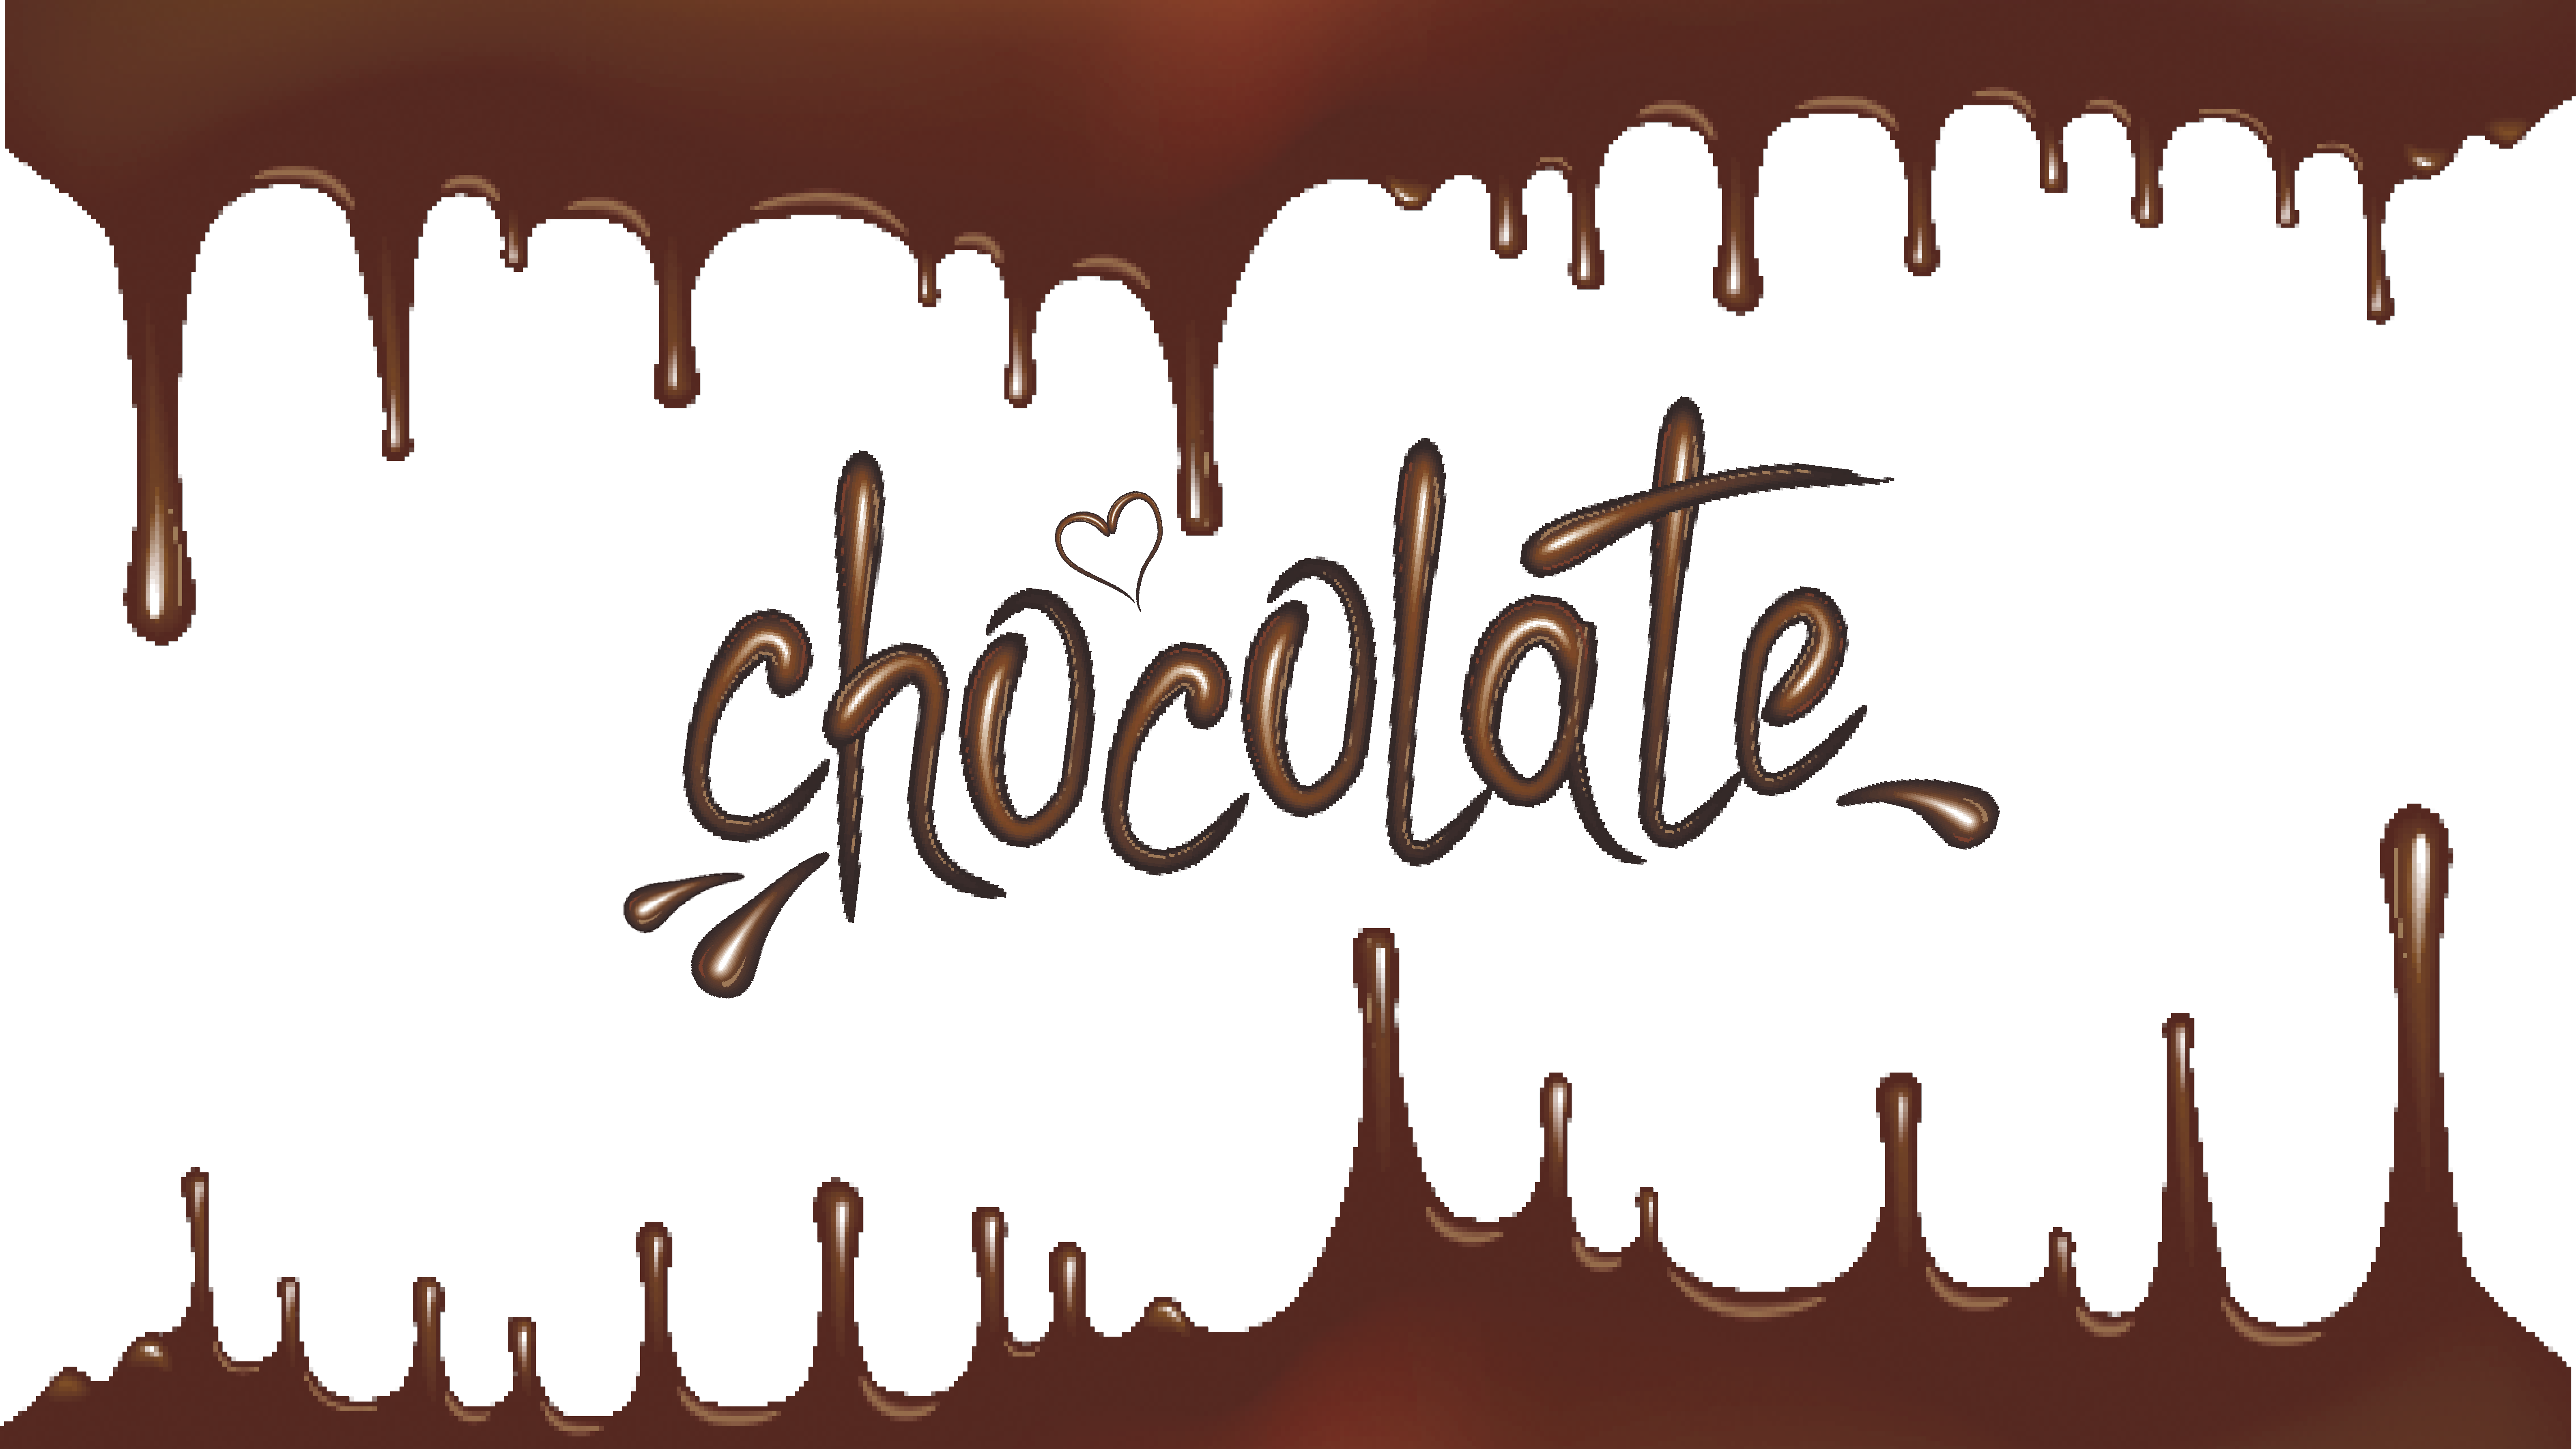 A world of chocolate